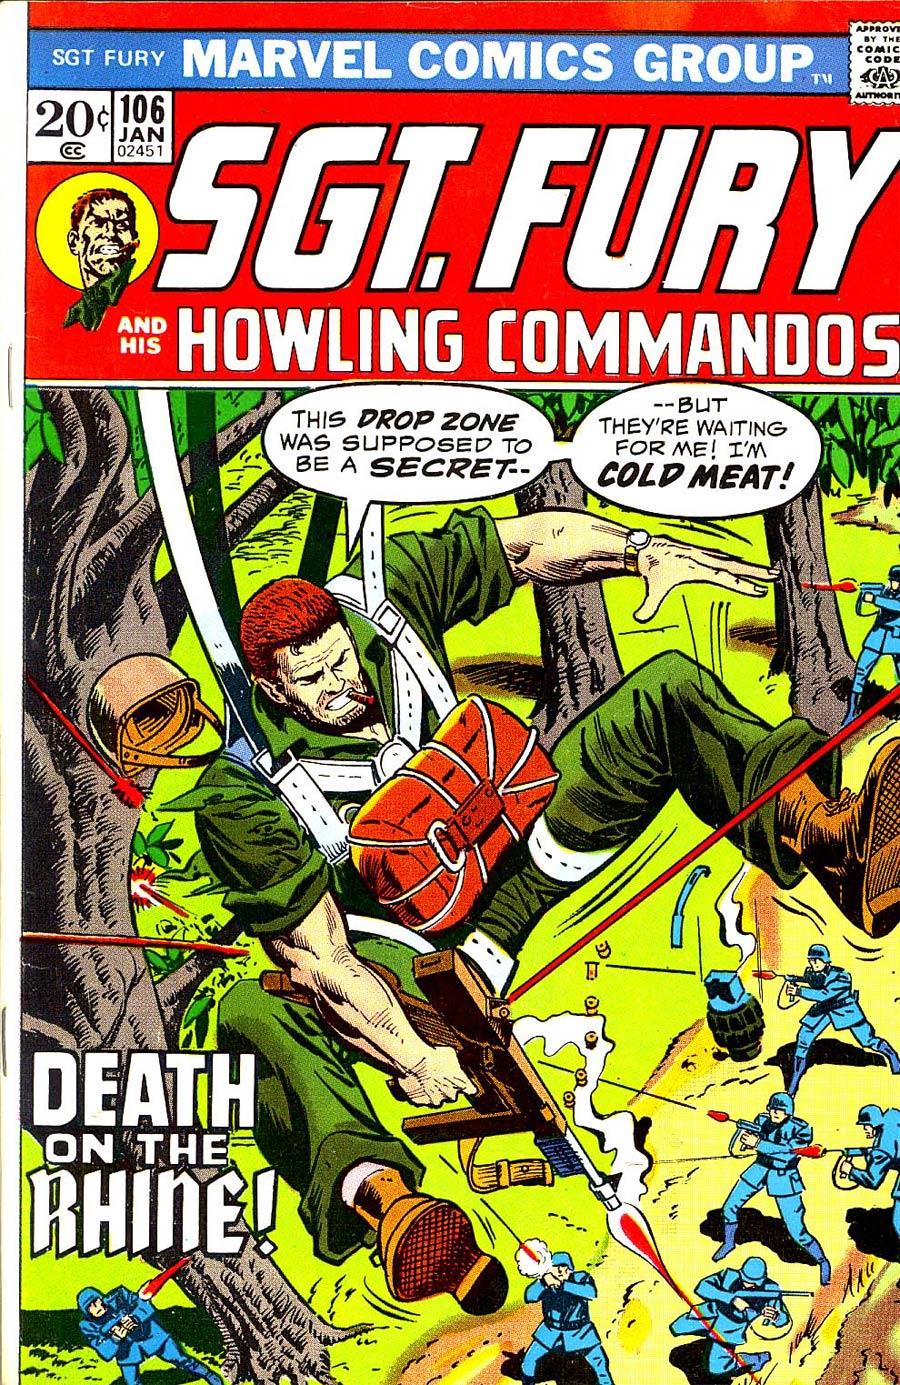 Sgt. Fury & His Howling Commandos #106